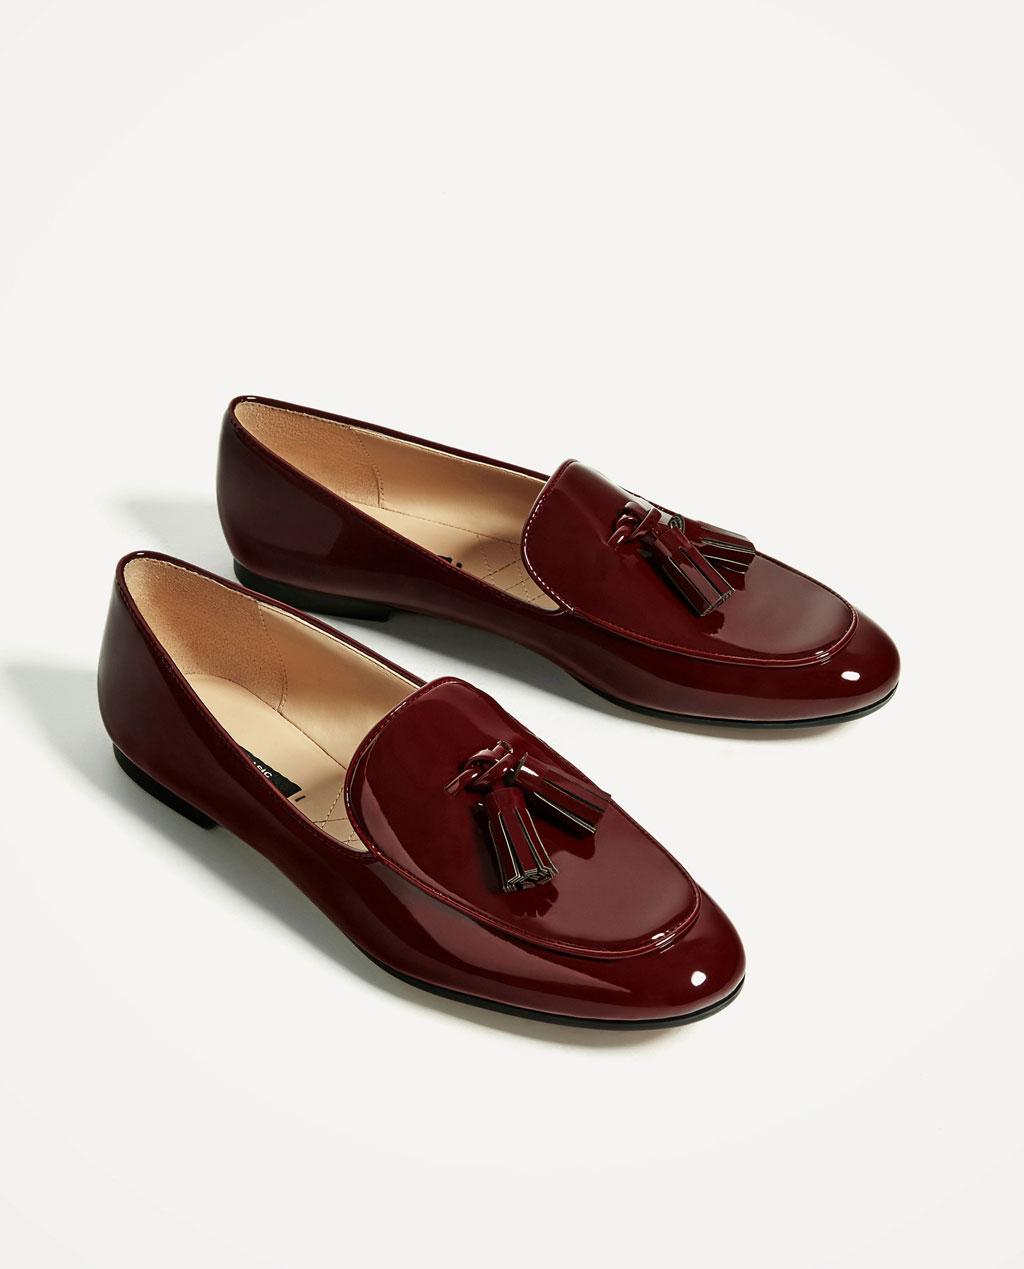 b48735439177 Mocassins Zara - Les 35 paires de mocassins que l on veut bien - Elle